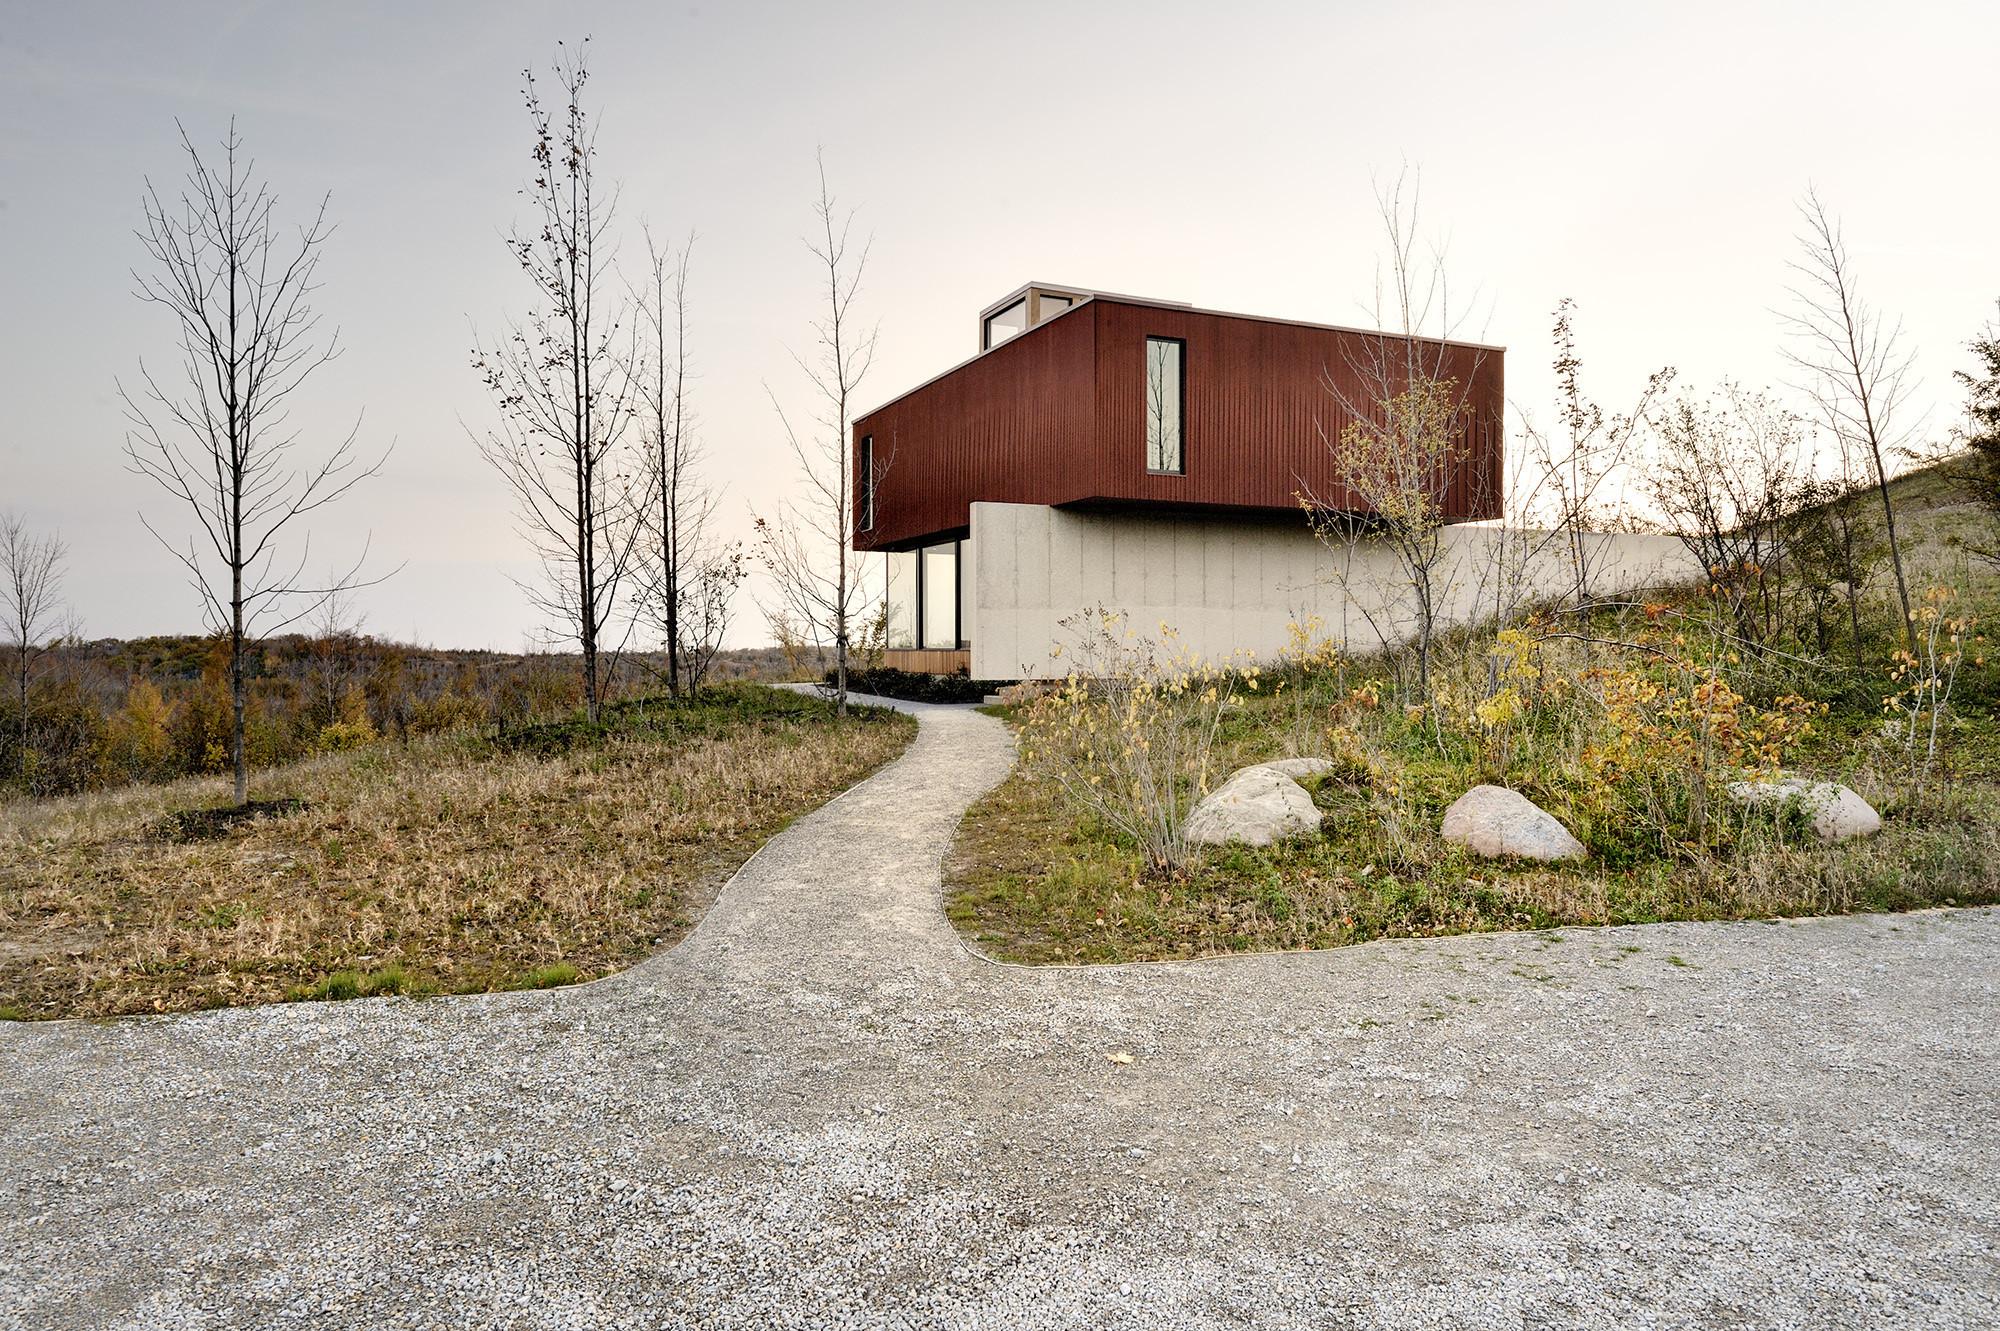 Williamson Chong to Receive RAIC's Emerging Practice Award, Frogs Hollow / Williamson Chong Architects. Image © Bob Gundu